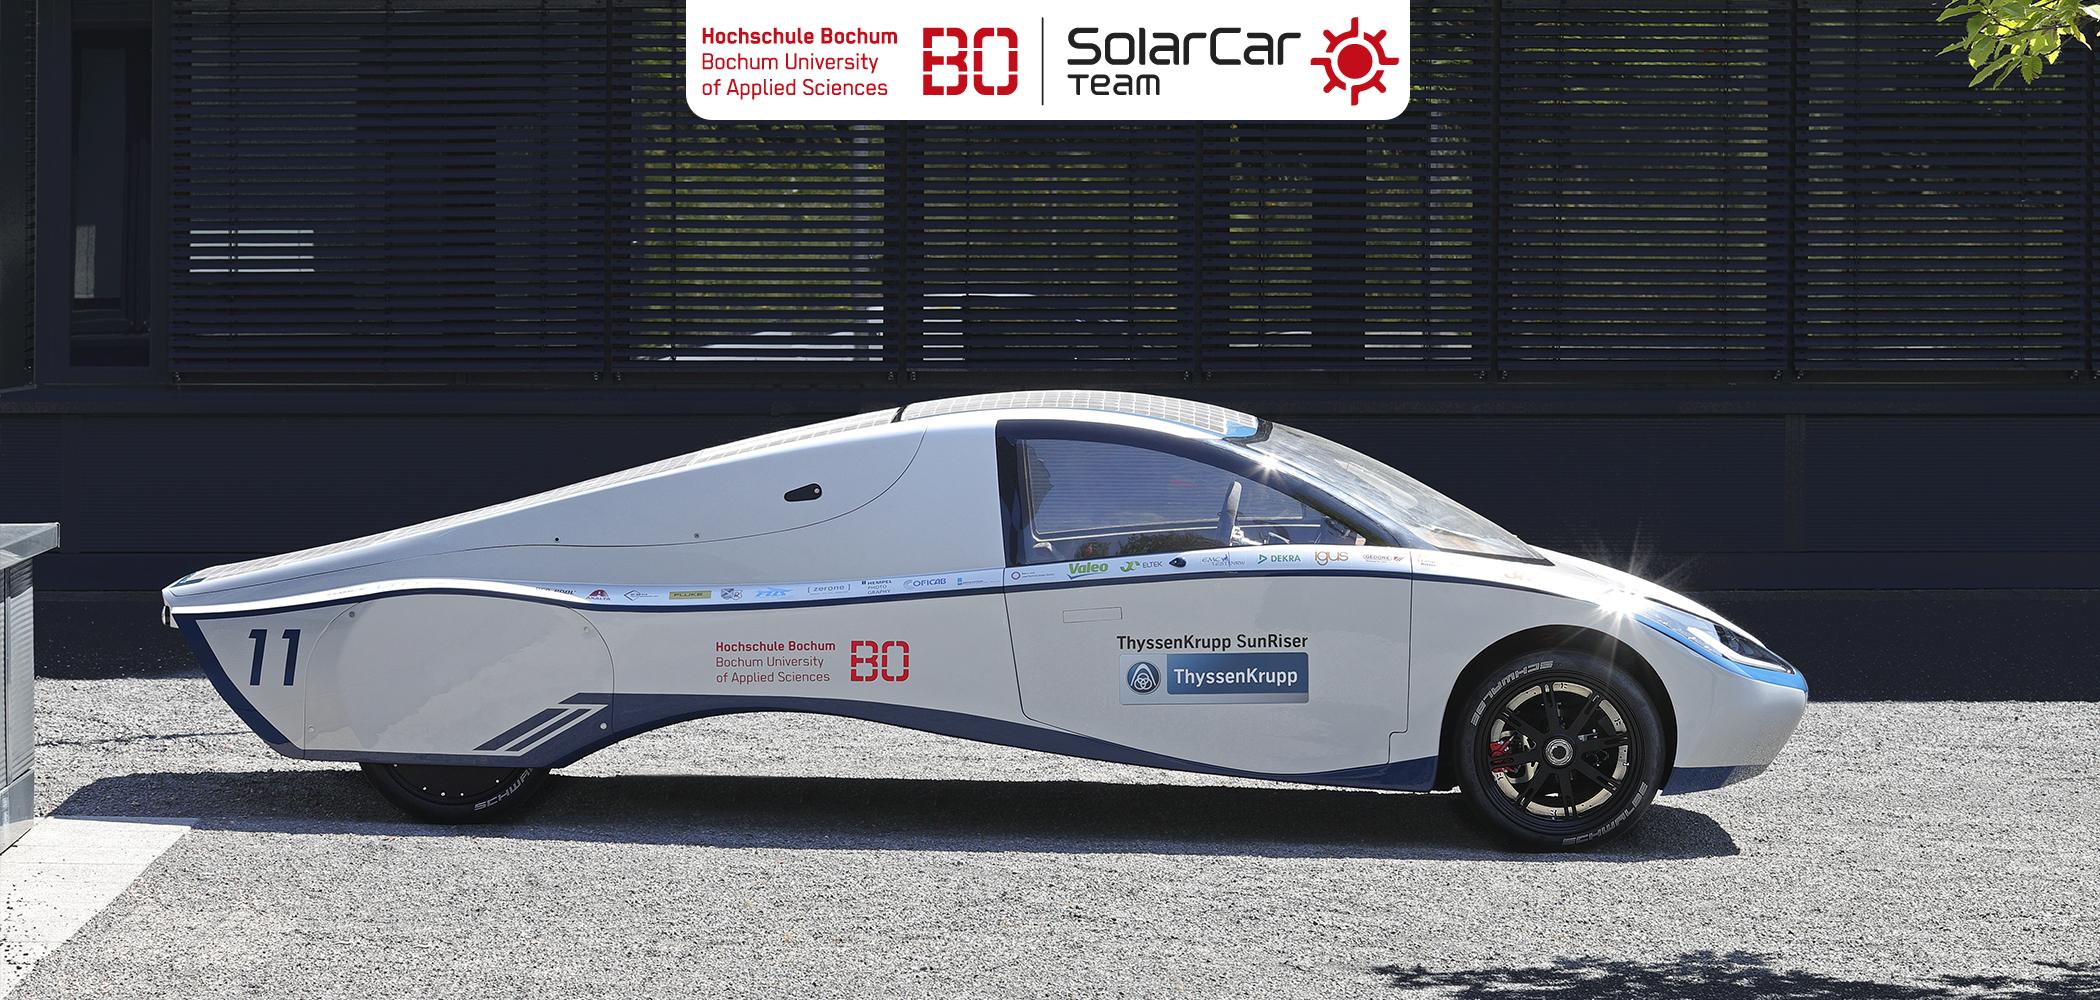 Silex Sponsort SolarCar Projekt